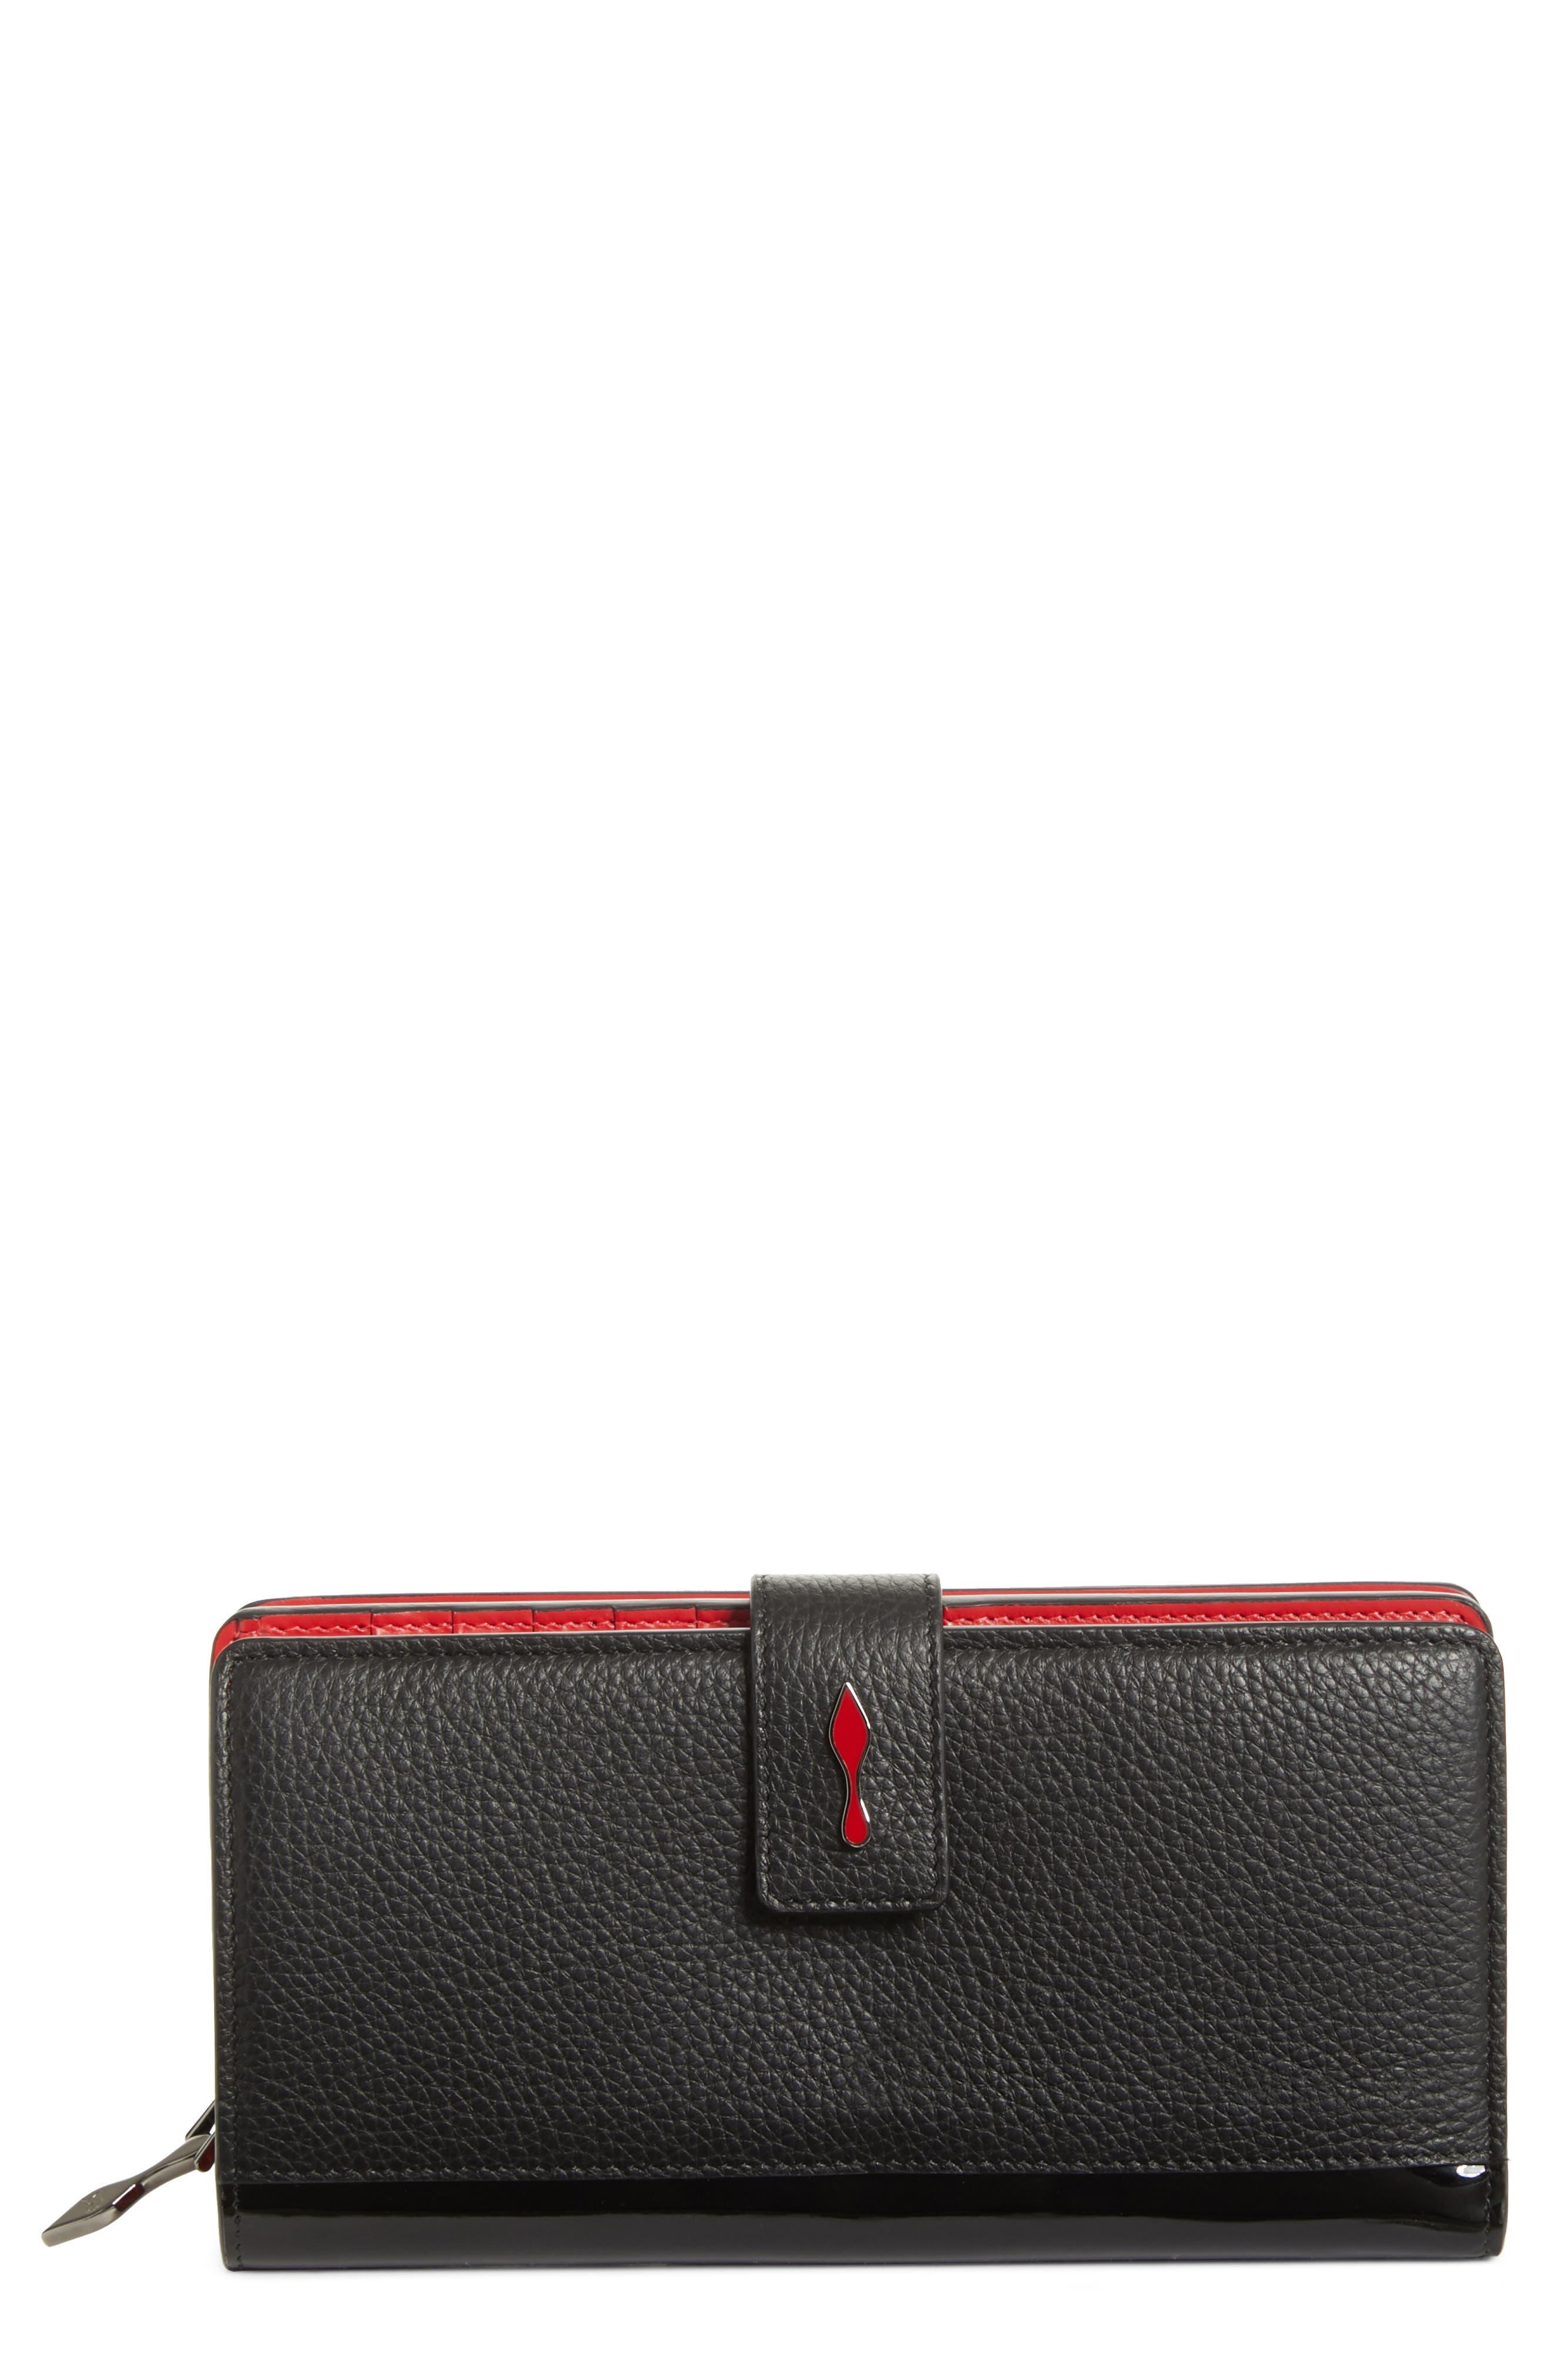 CHRISTIAN LOUBOUTIN Paloma Calfskin Leather Wallet, Main, color, 007